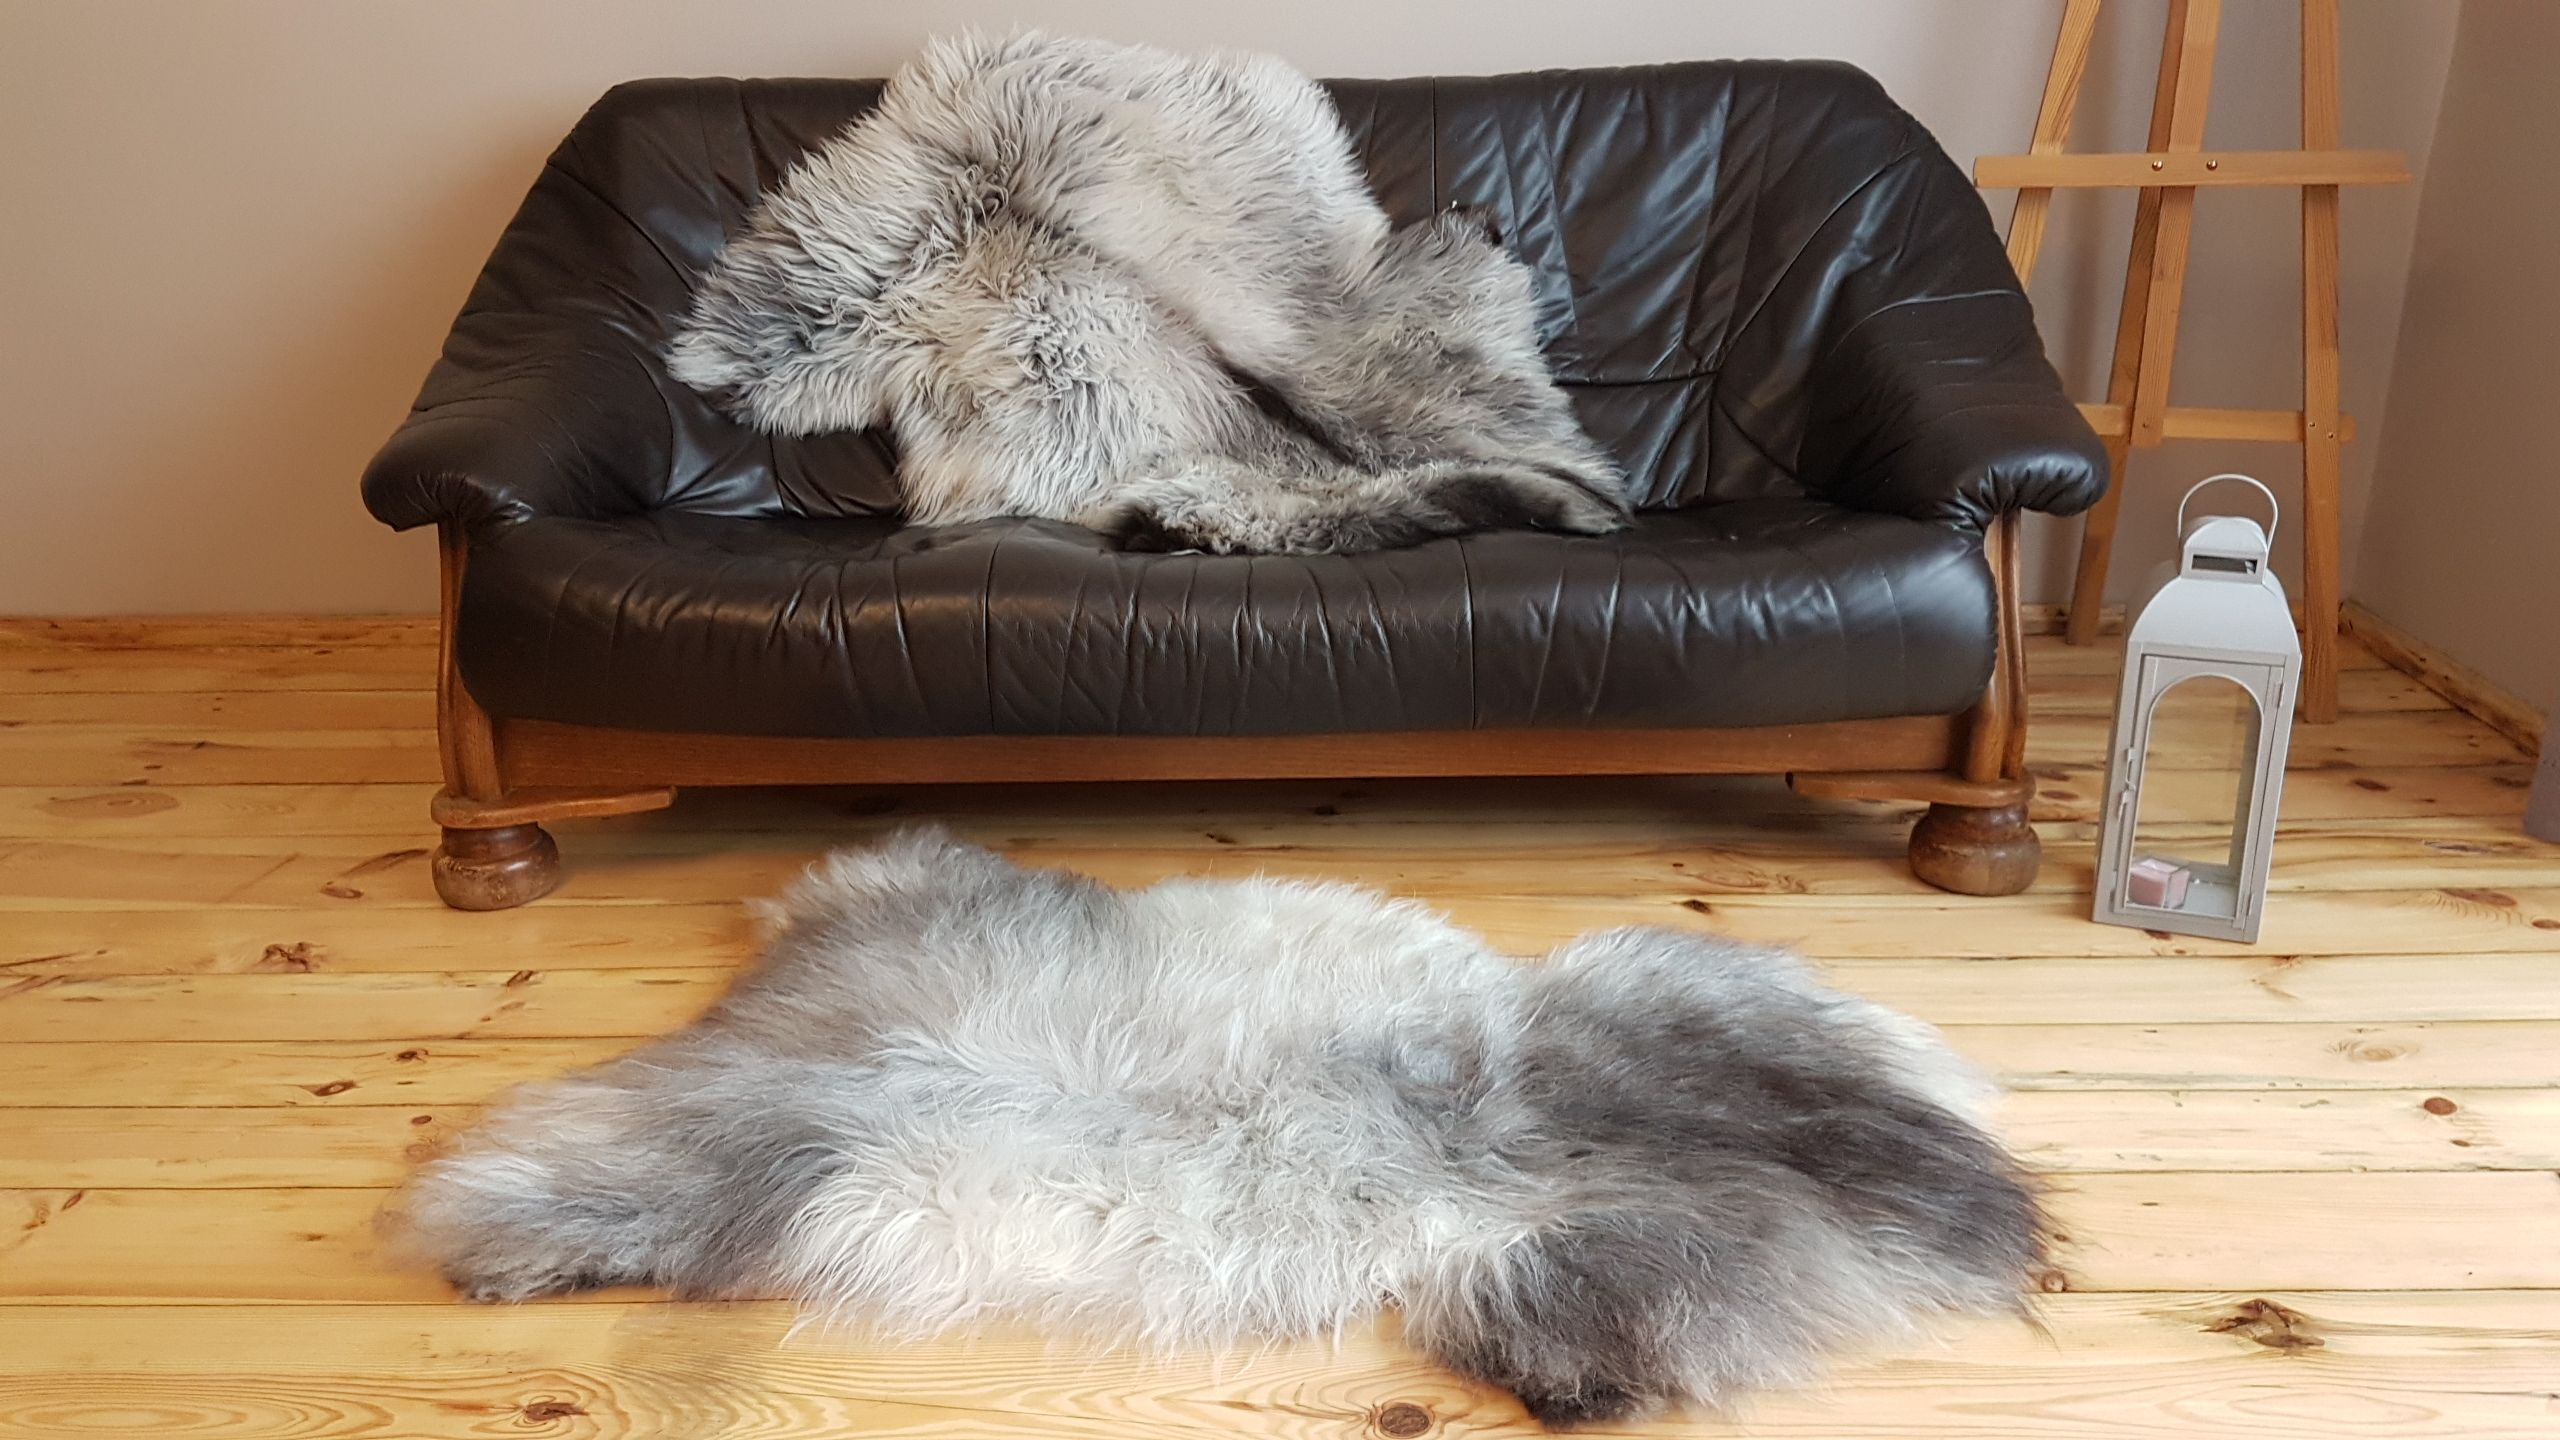 Genuine Sheepskin Melerade 100 Natural Exclusive Carpet Nordic Style Perfect Gift Uniqe Luxury Rug Long Wool Mix Grey Pelt Luxury Rug Nordic Style Sheepskin